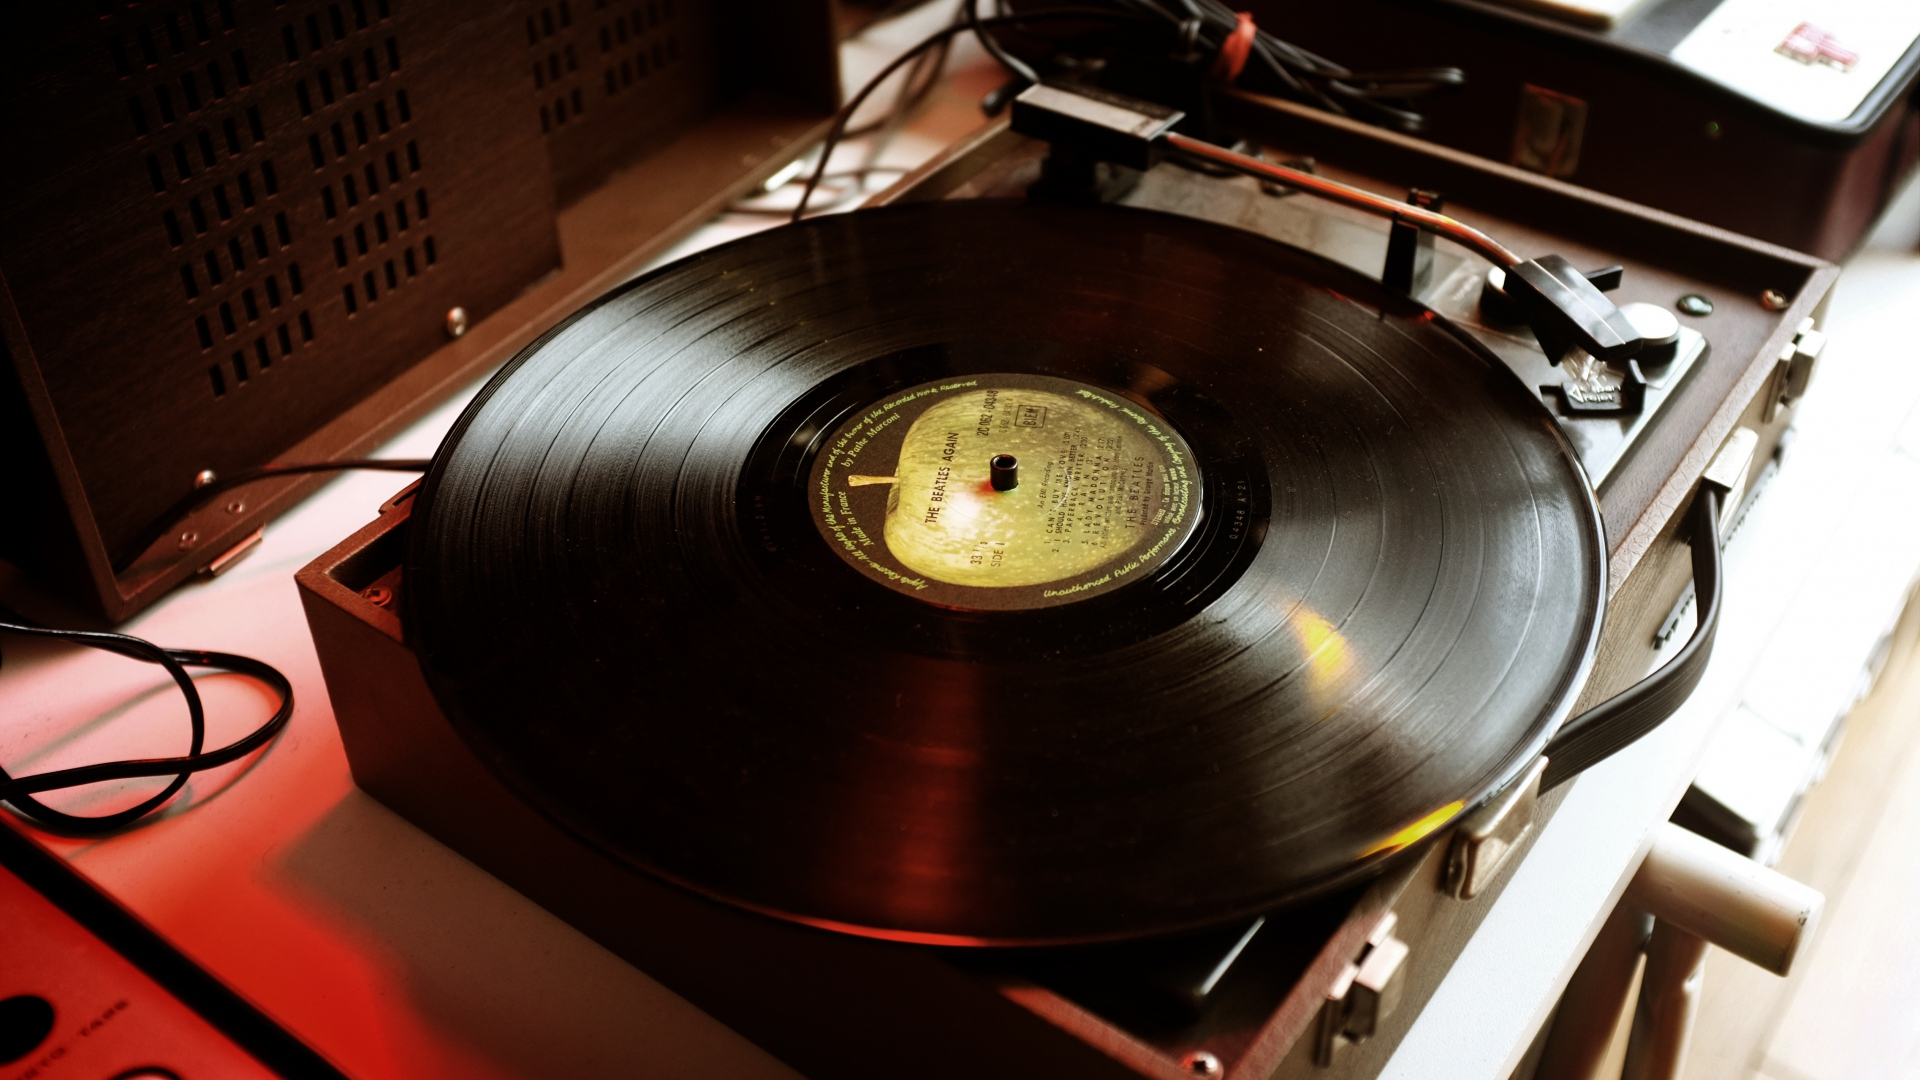 hd hintergrundbilder schallplatte musik plattenspieler 1920x1080